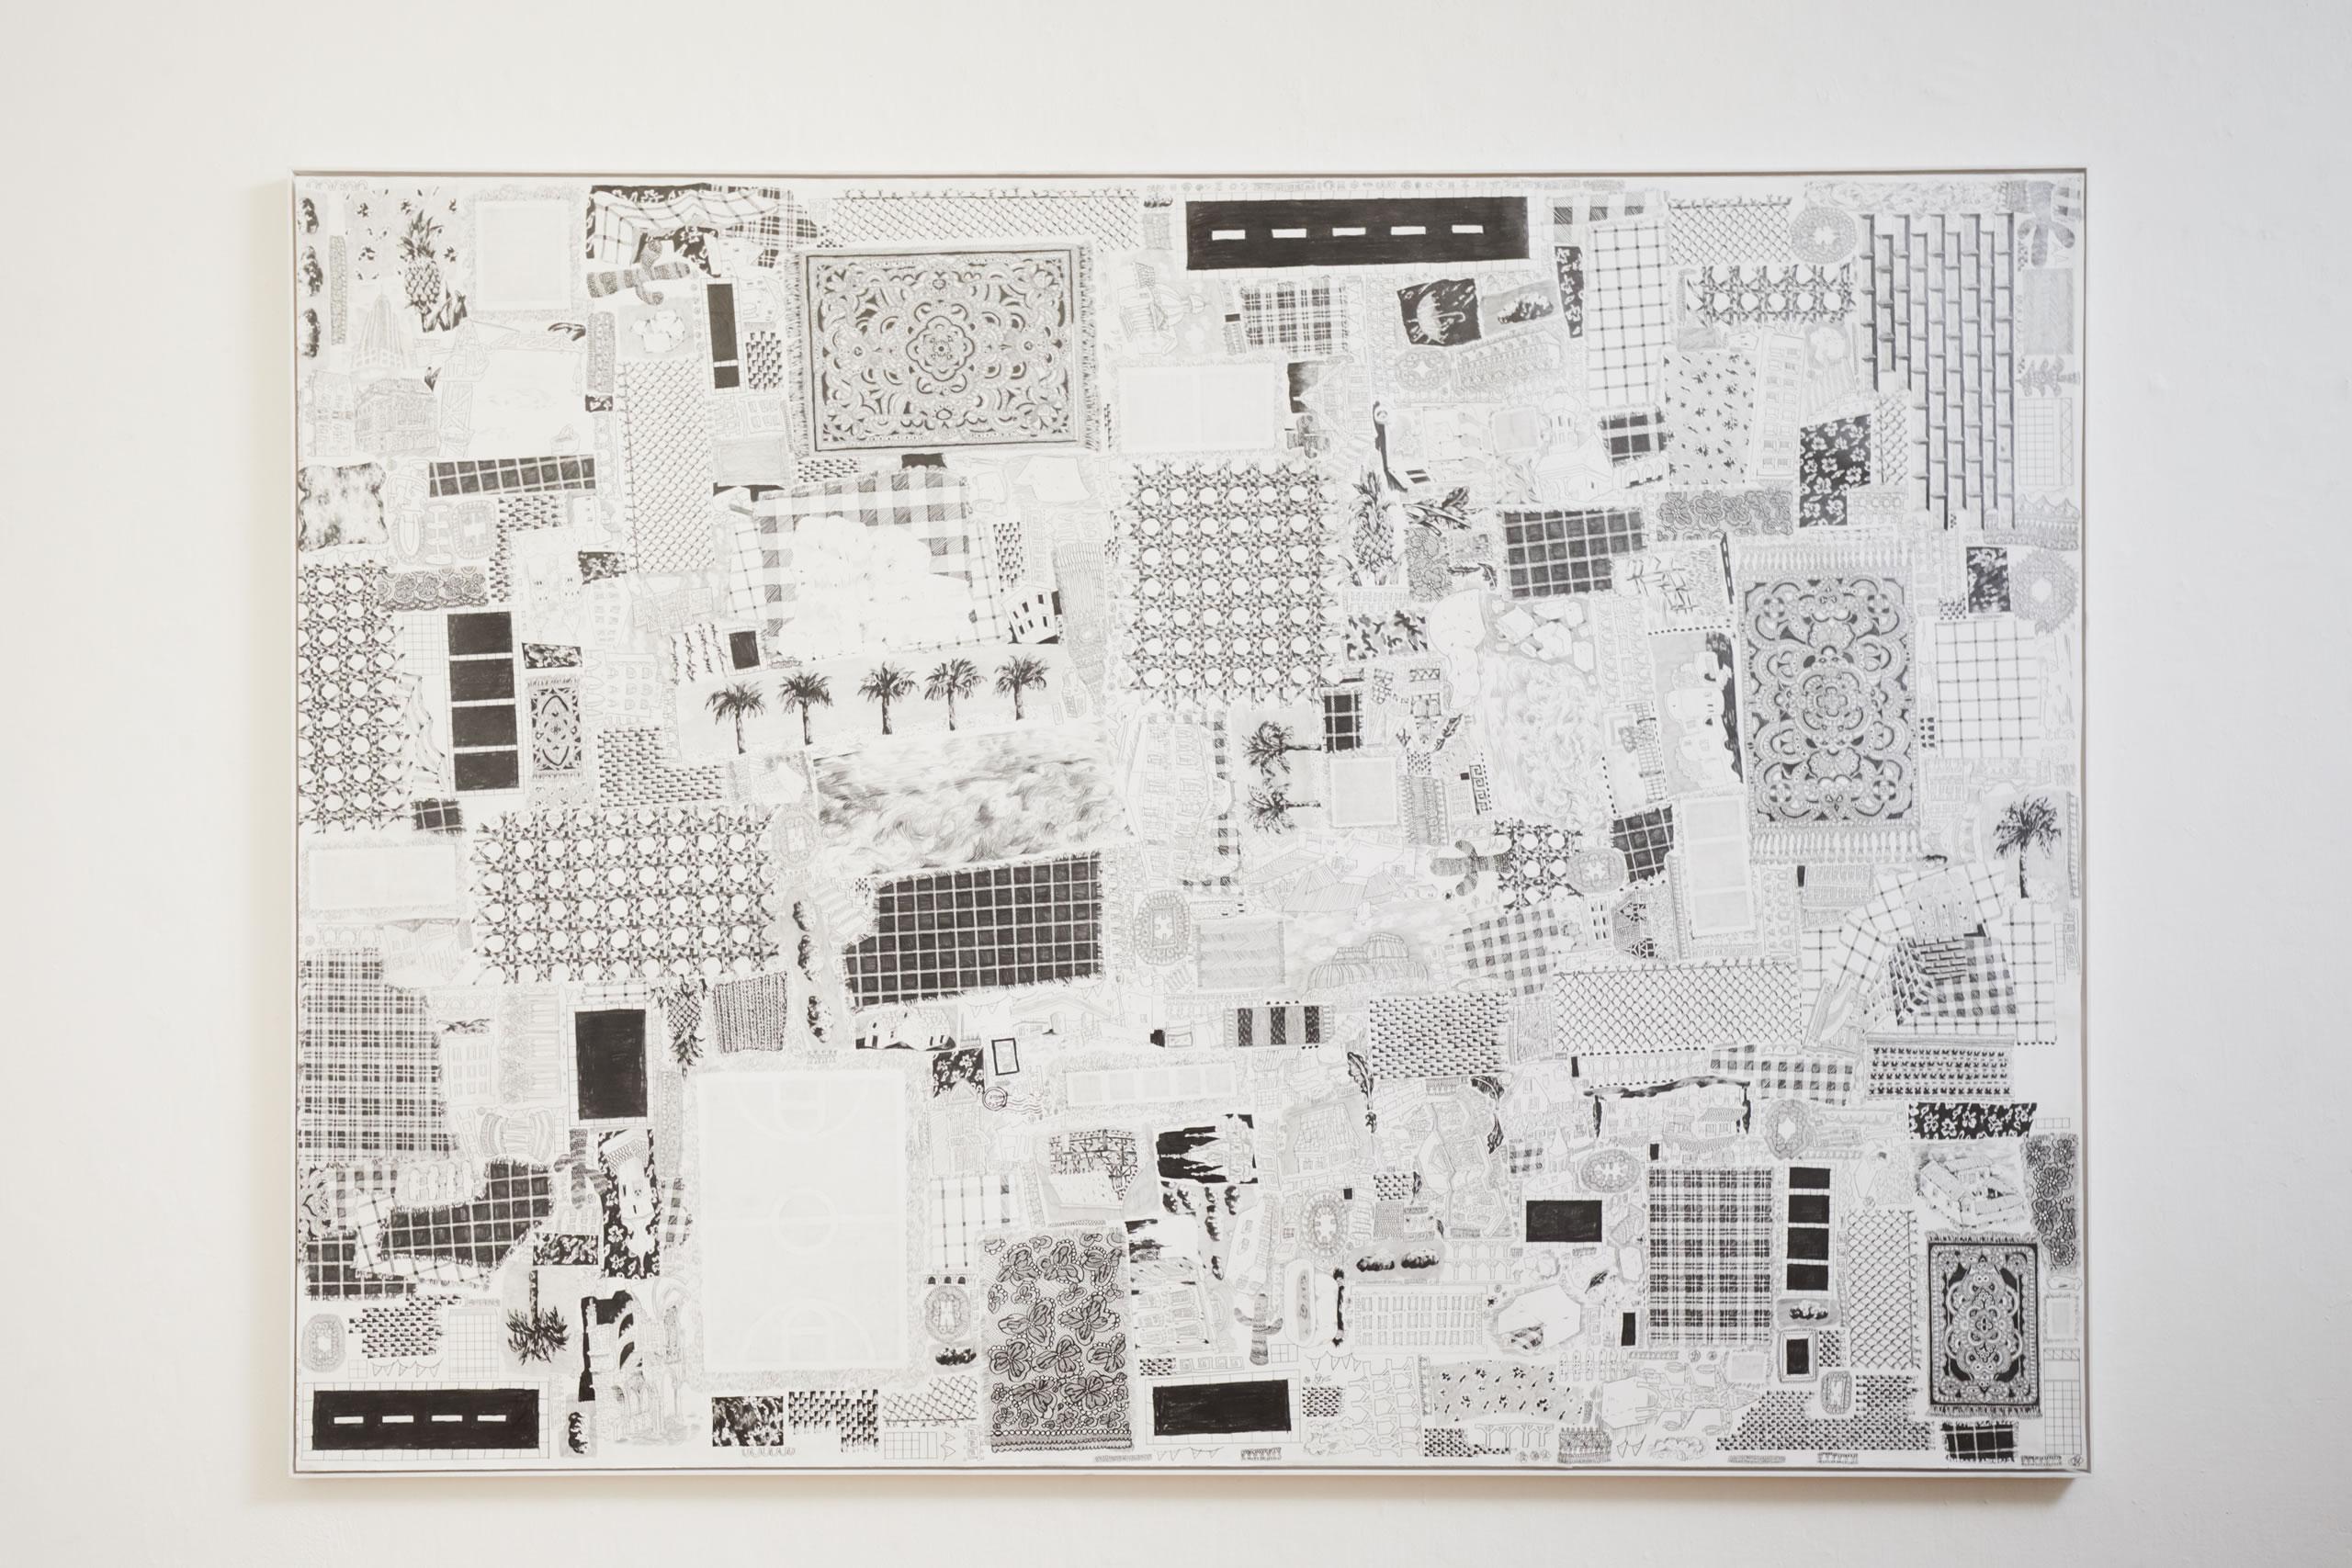 Patrick Roman Scherer | Foto Johannes Puch | Galerie3